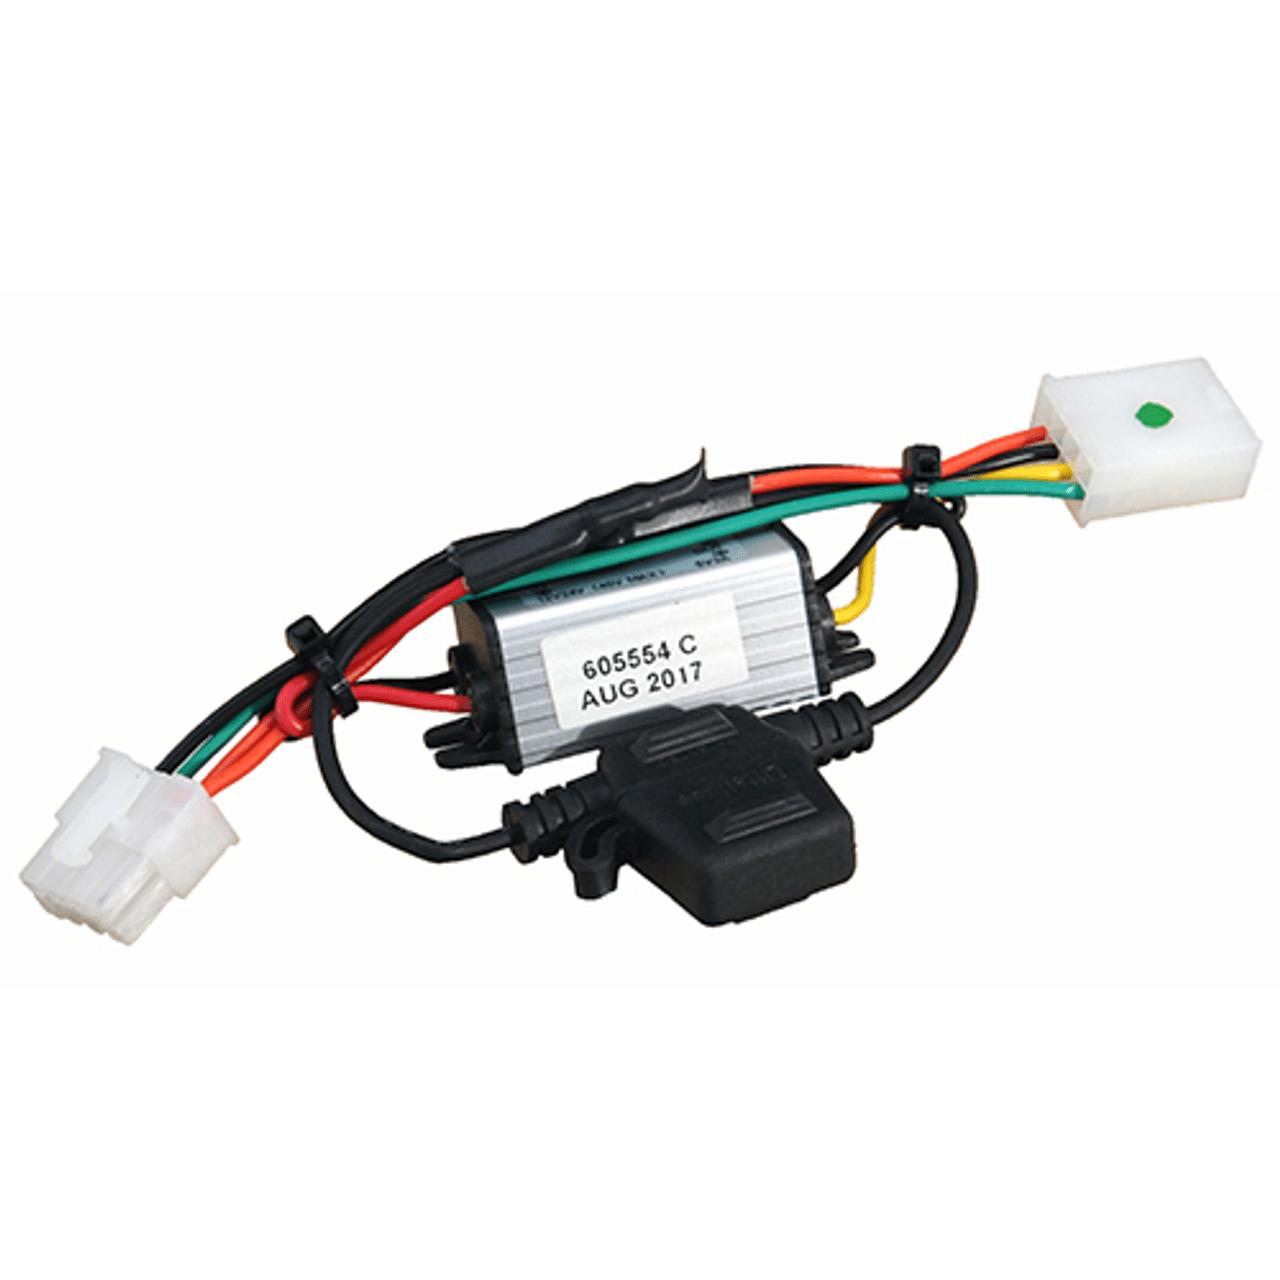 hustler wire harness adapter 605554  [ 1280 x 1280 Pixel ]